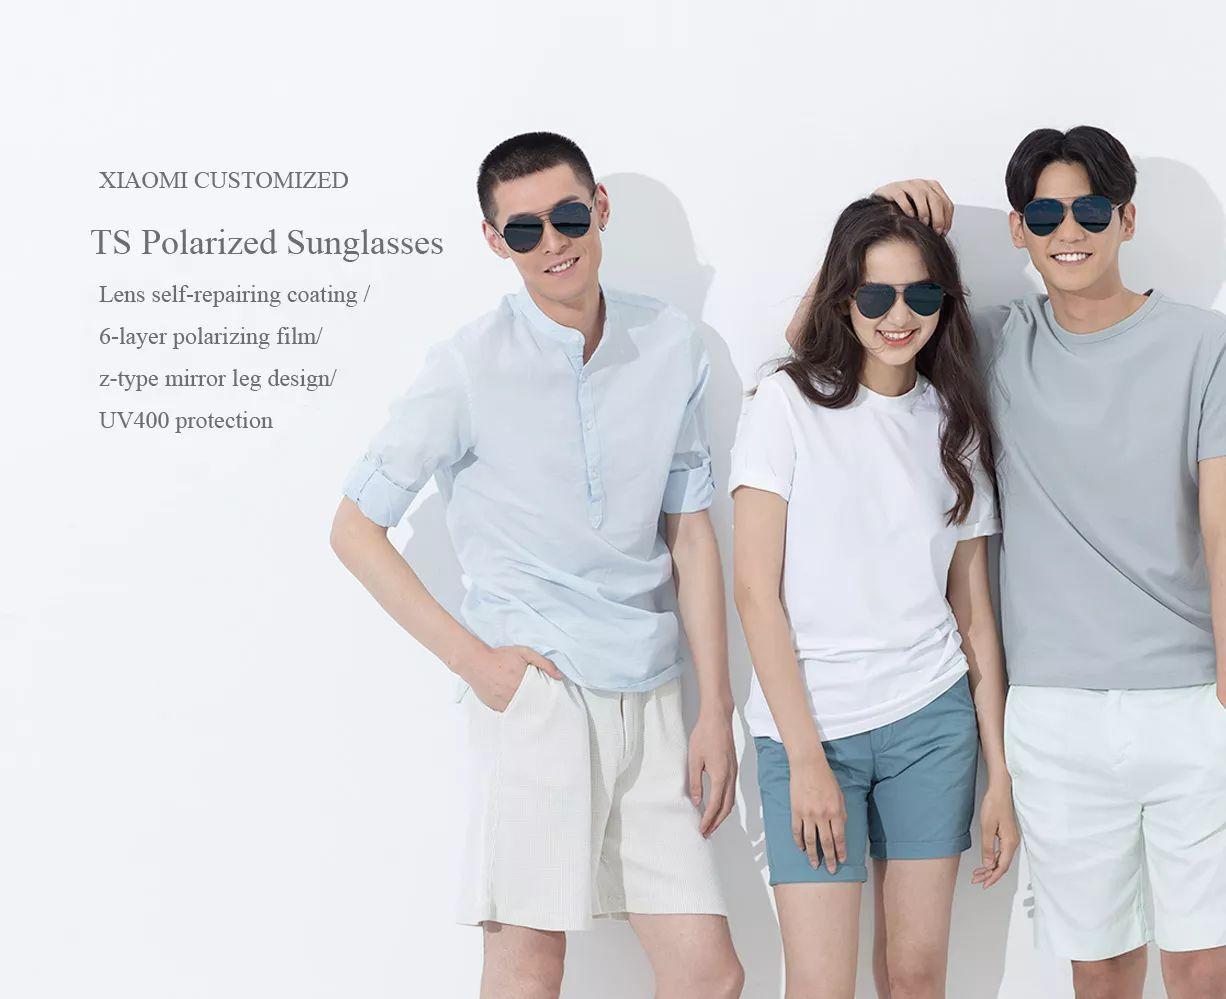 Xiaomi Uv400 Ts Polarized Light Sunglasses New Edition (3)